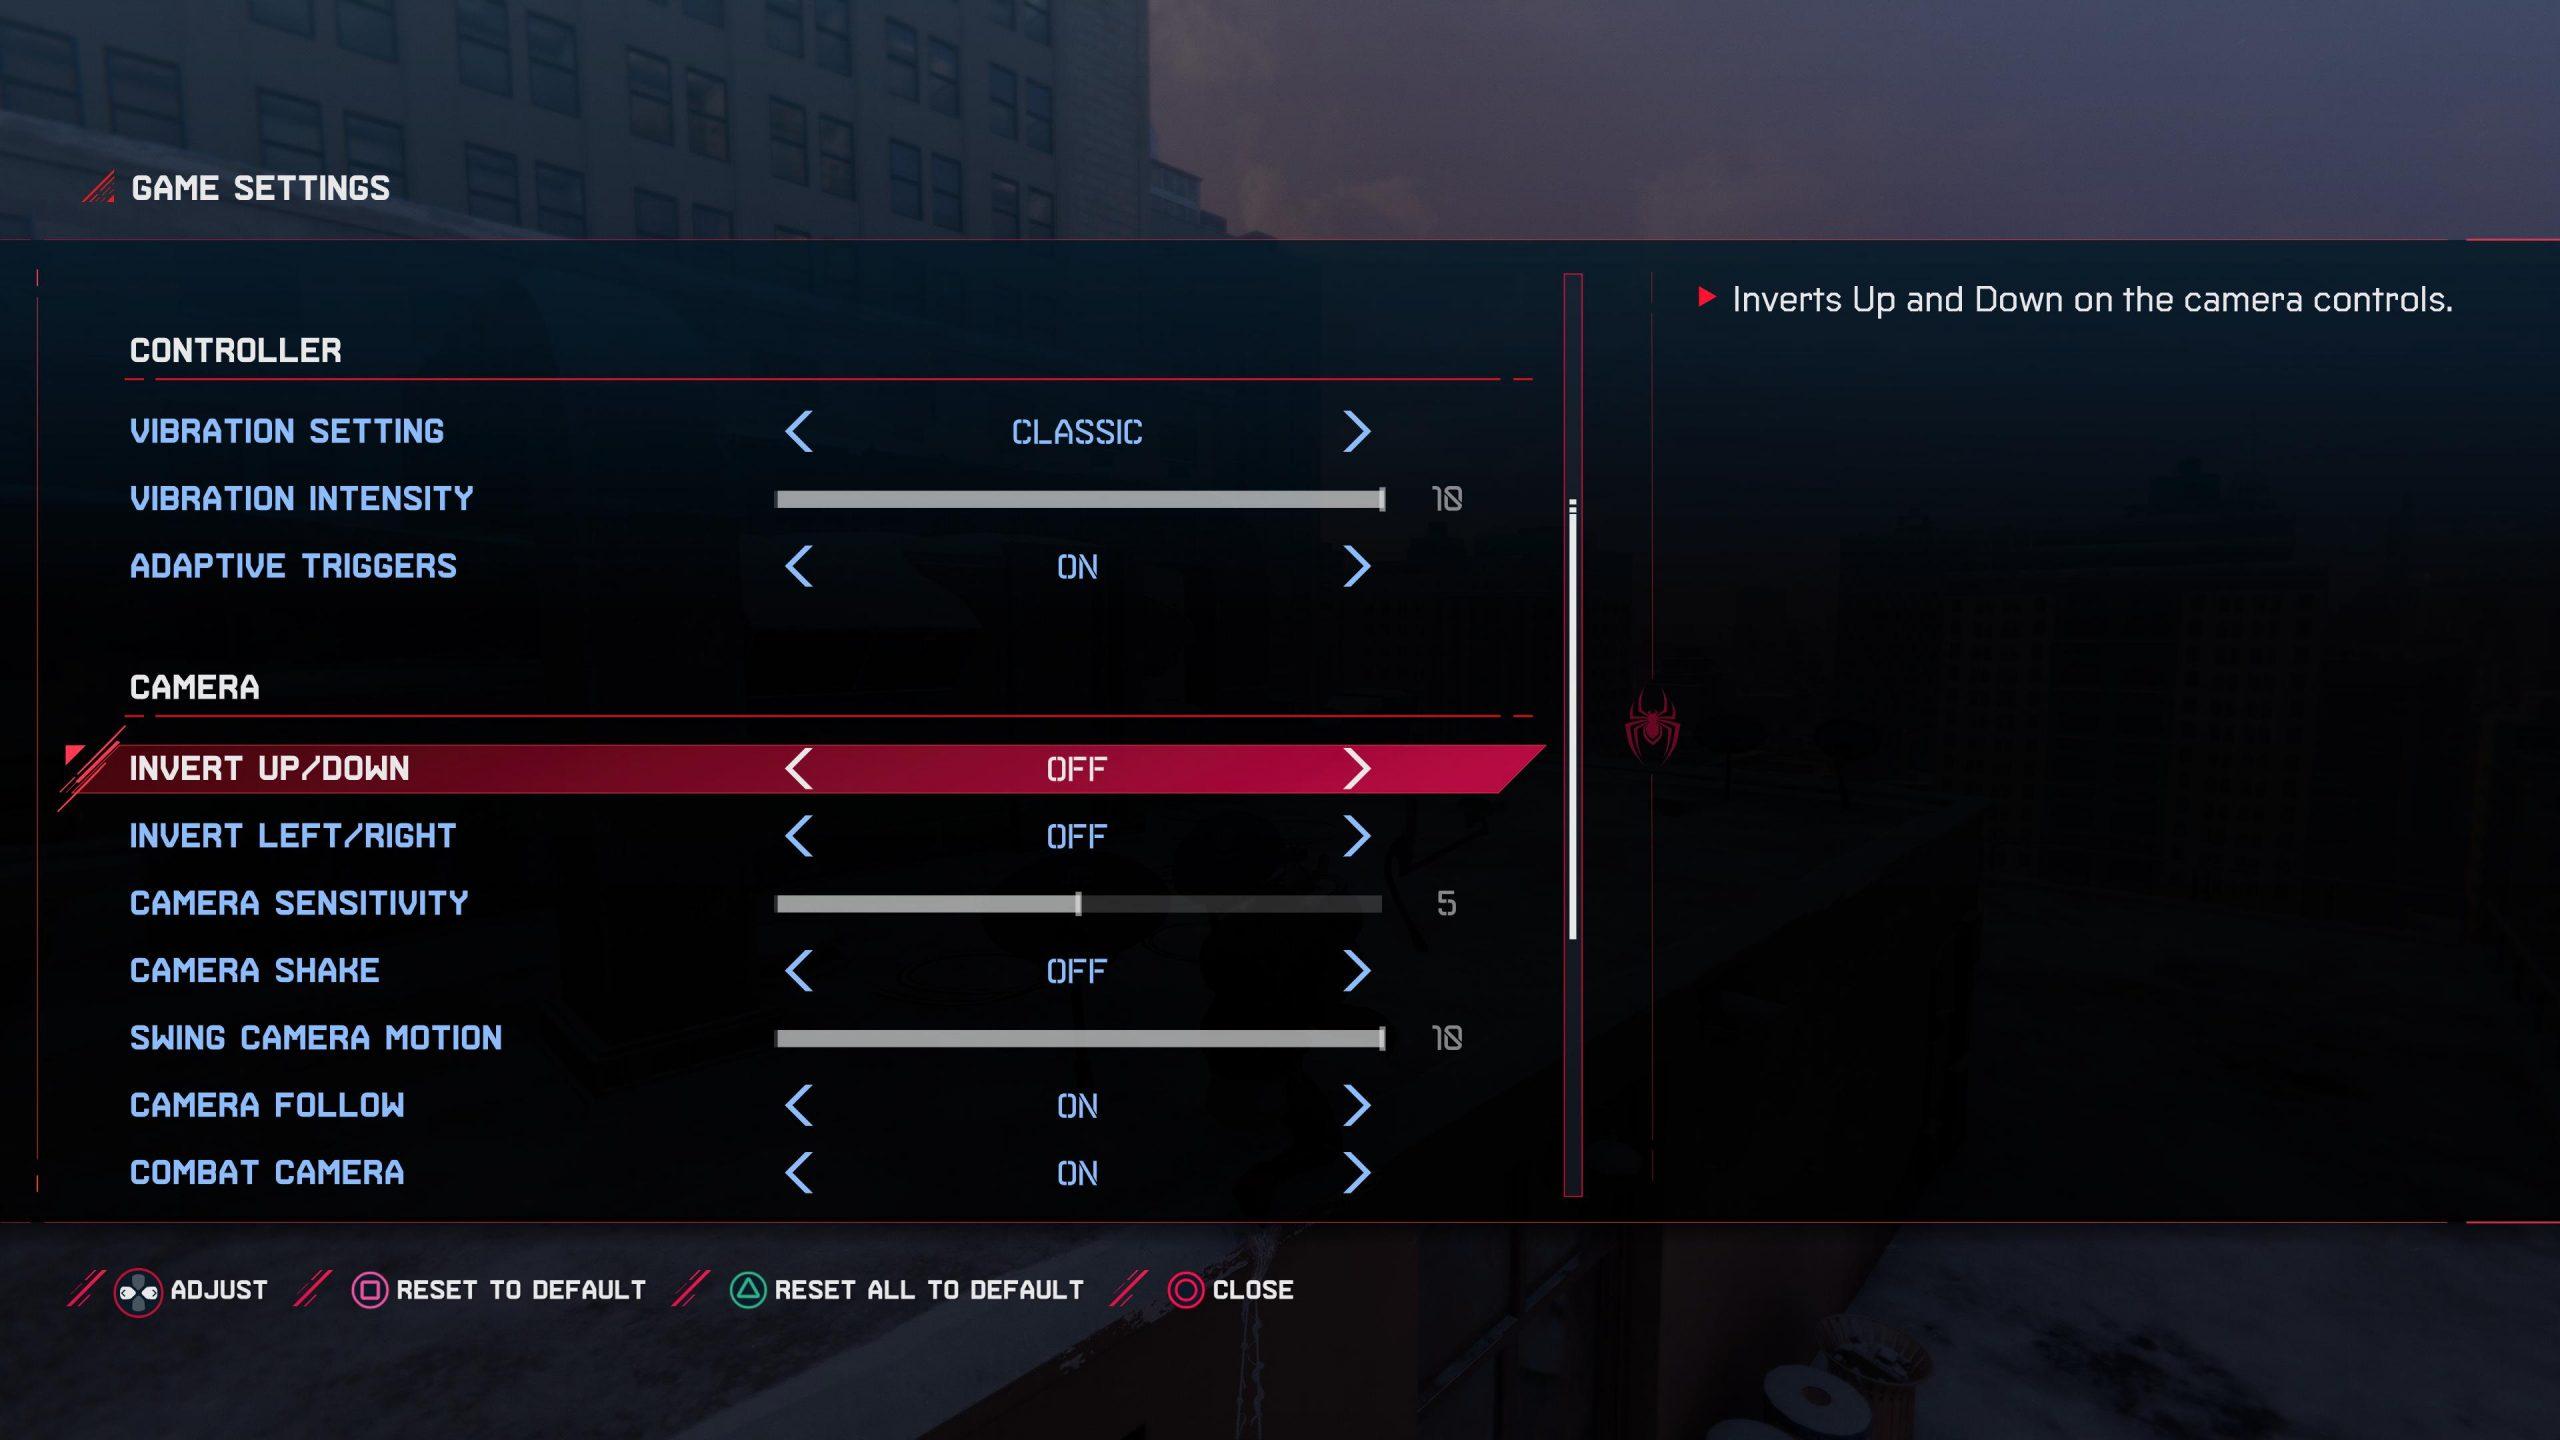 A screenshot showing the camera settings